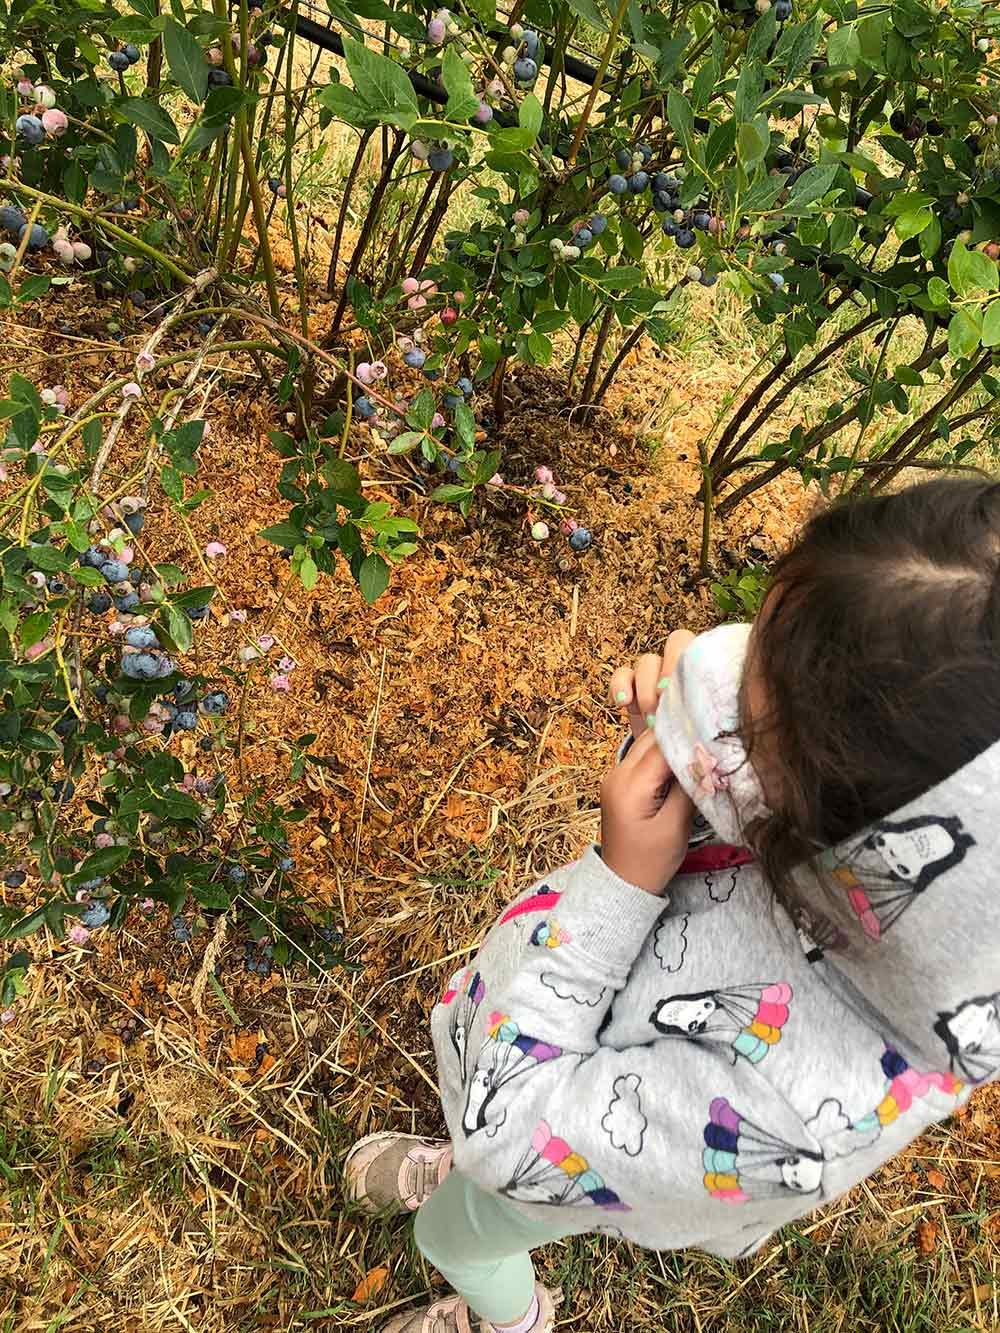 duckworth farms coycoy eating blueberries